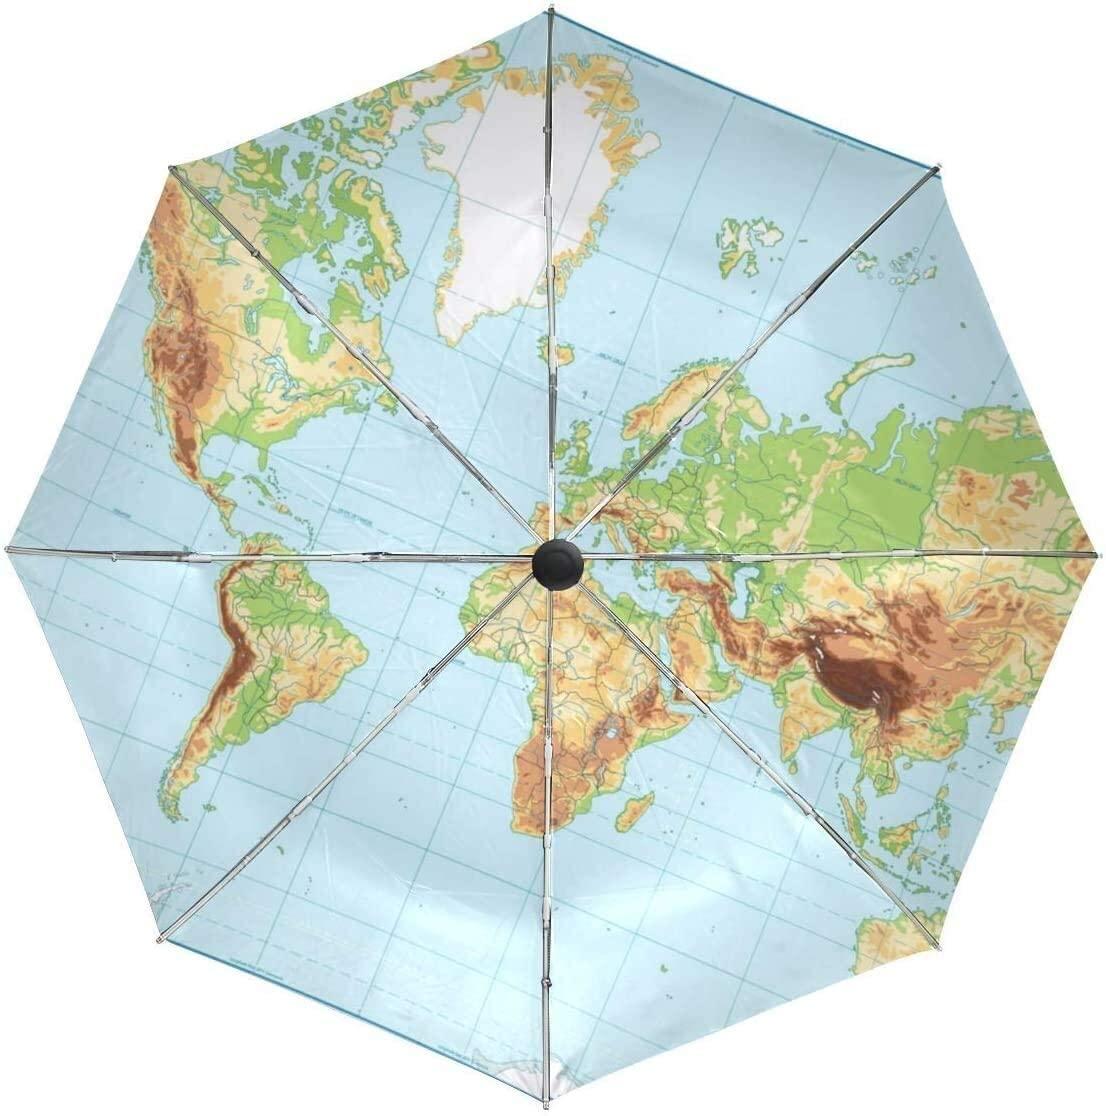 ASDF Automatic Umbrellas Geometric World Map Plaid Anti-Slip Windproof Compact Rain Umbrella for Women Men